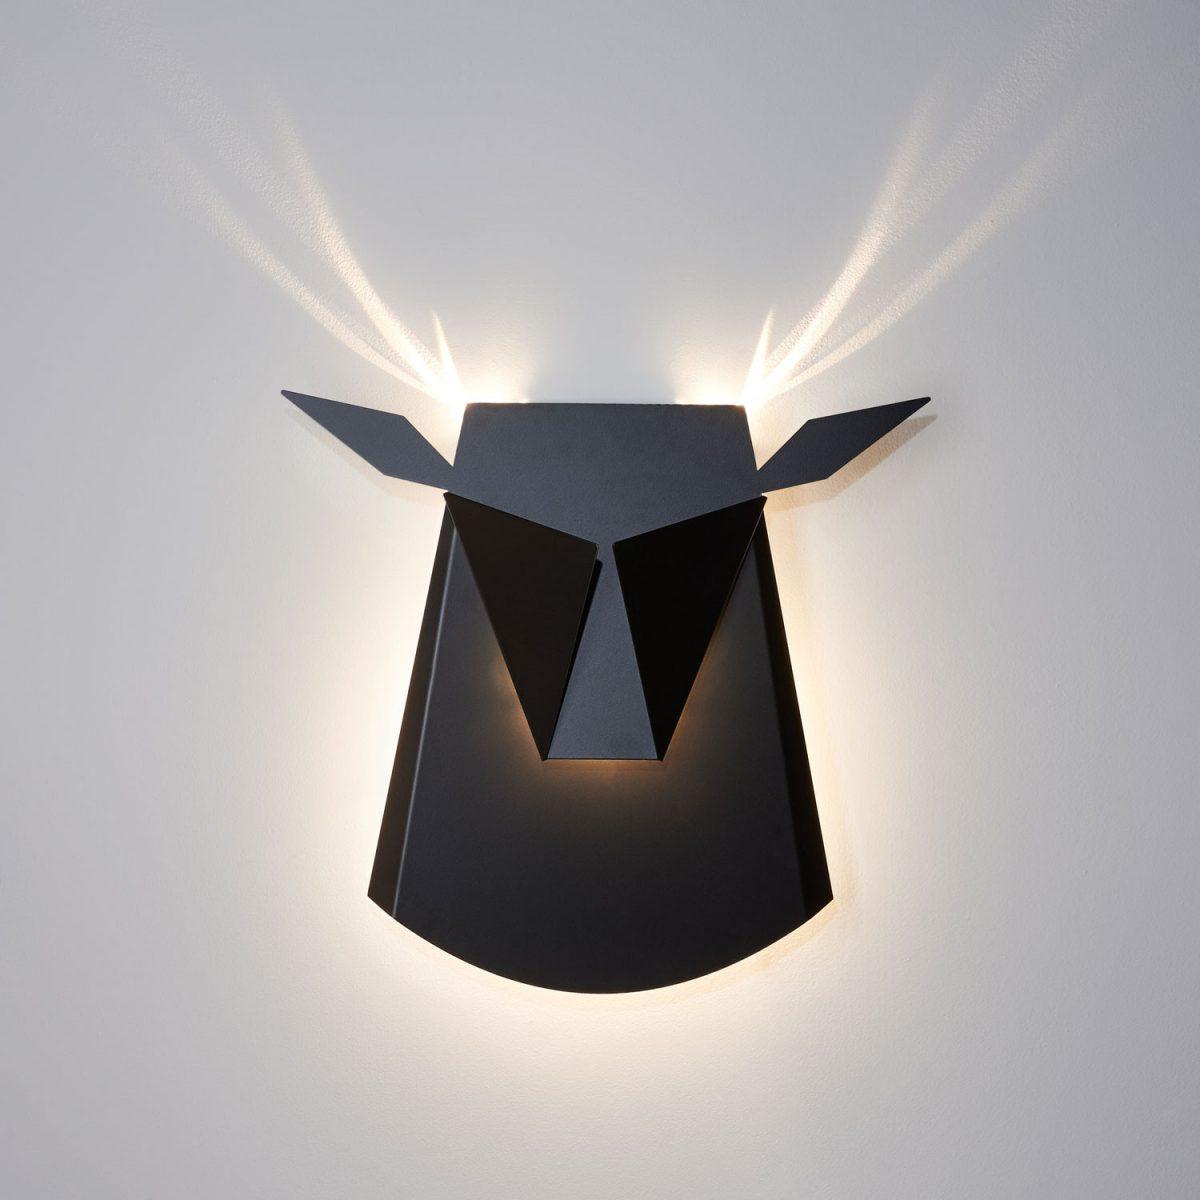 animal-applique-lumiere-09